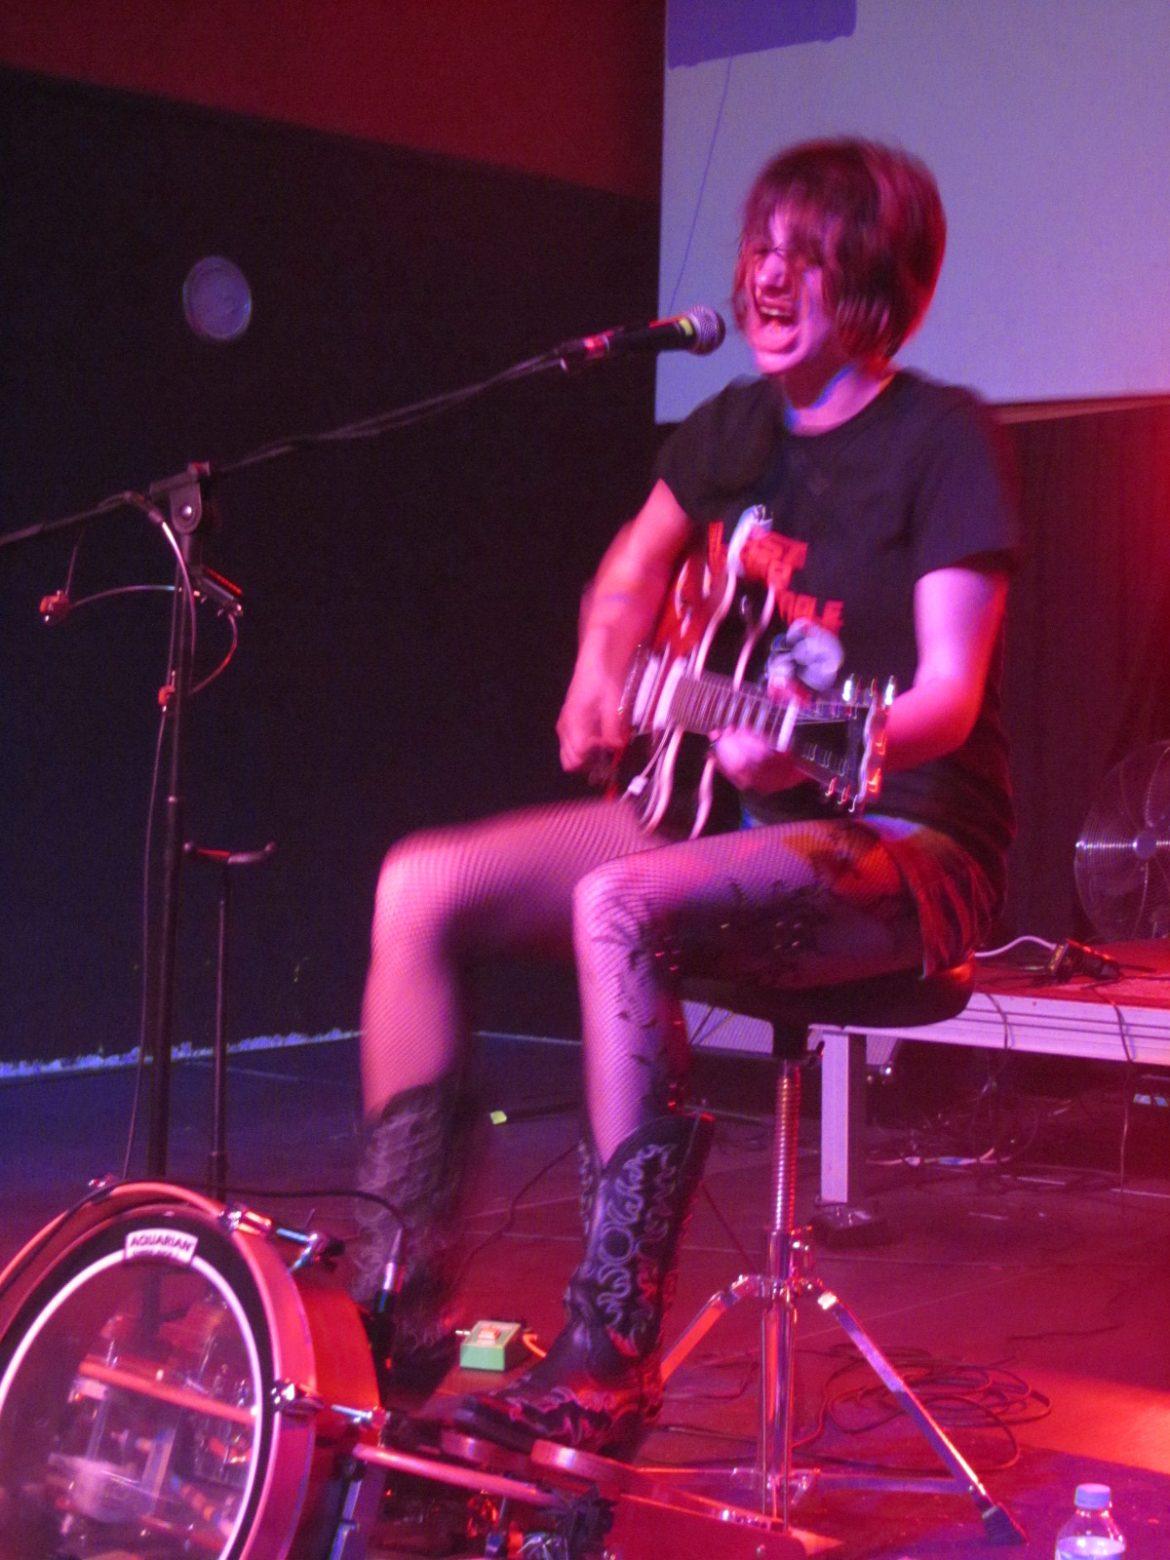 Molly Gene One Whoaman Band soberbia en Tenerife con su Dirty Delta Thrash 2013